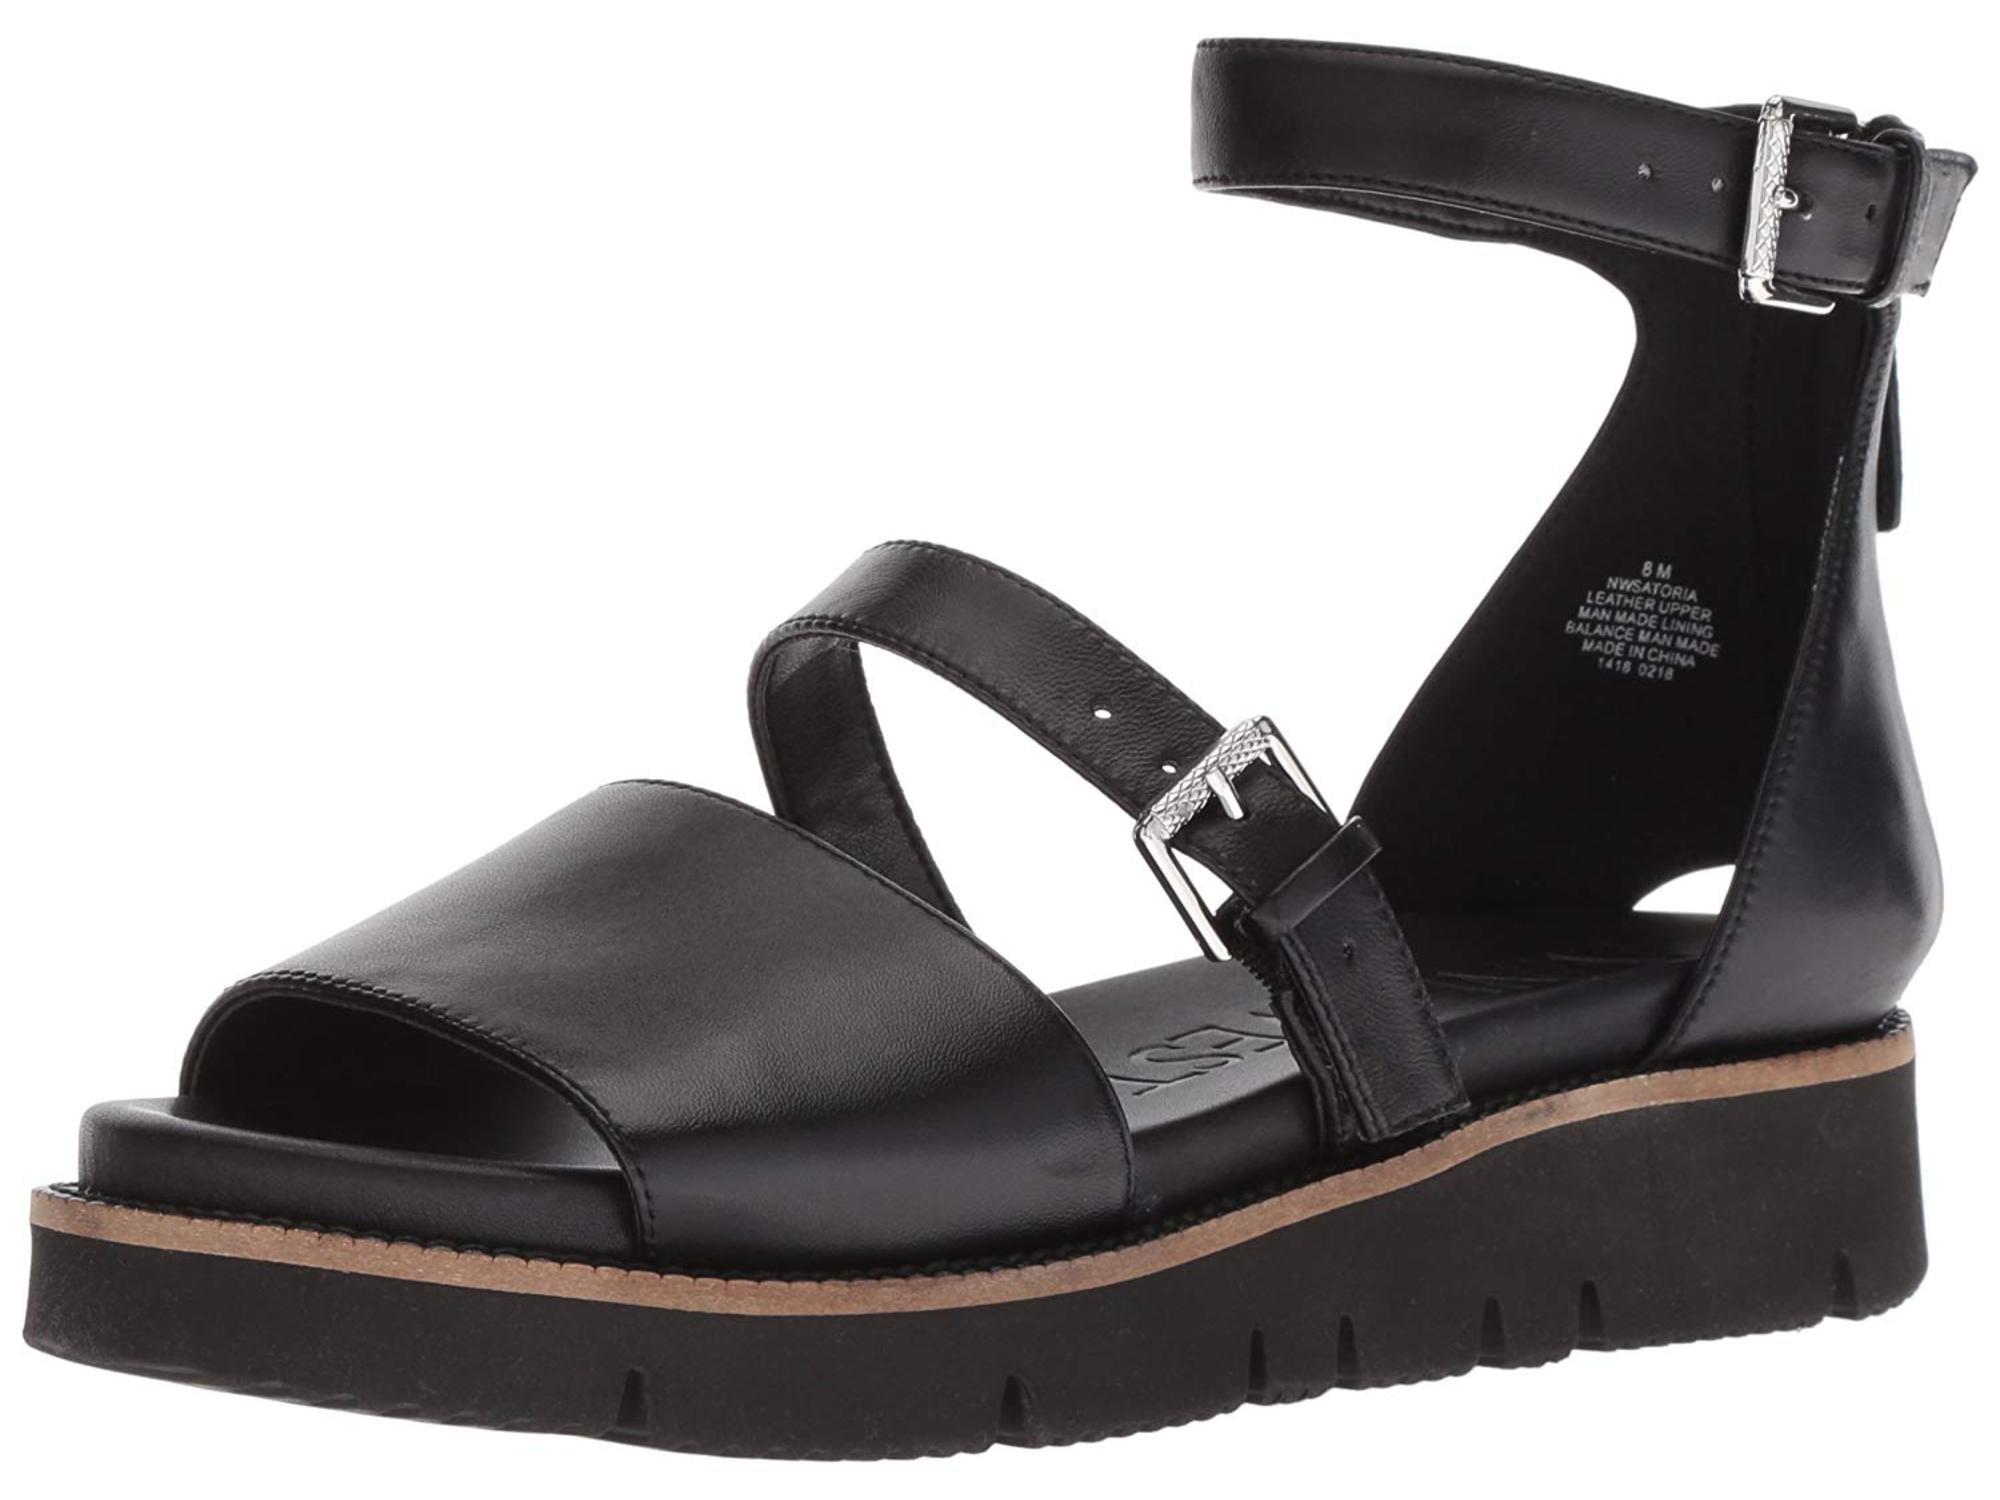 Satoria Leather Flat Sandal - Walmart